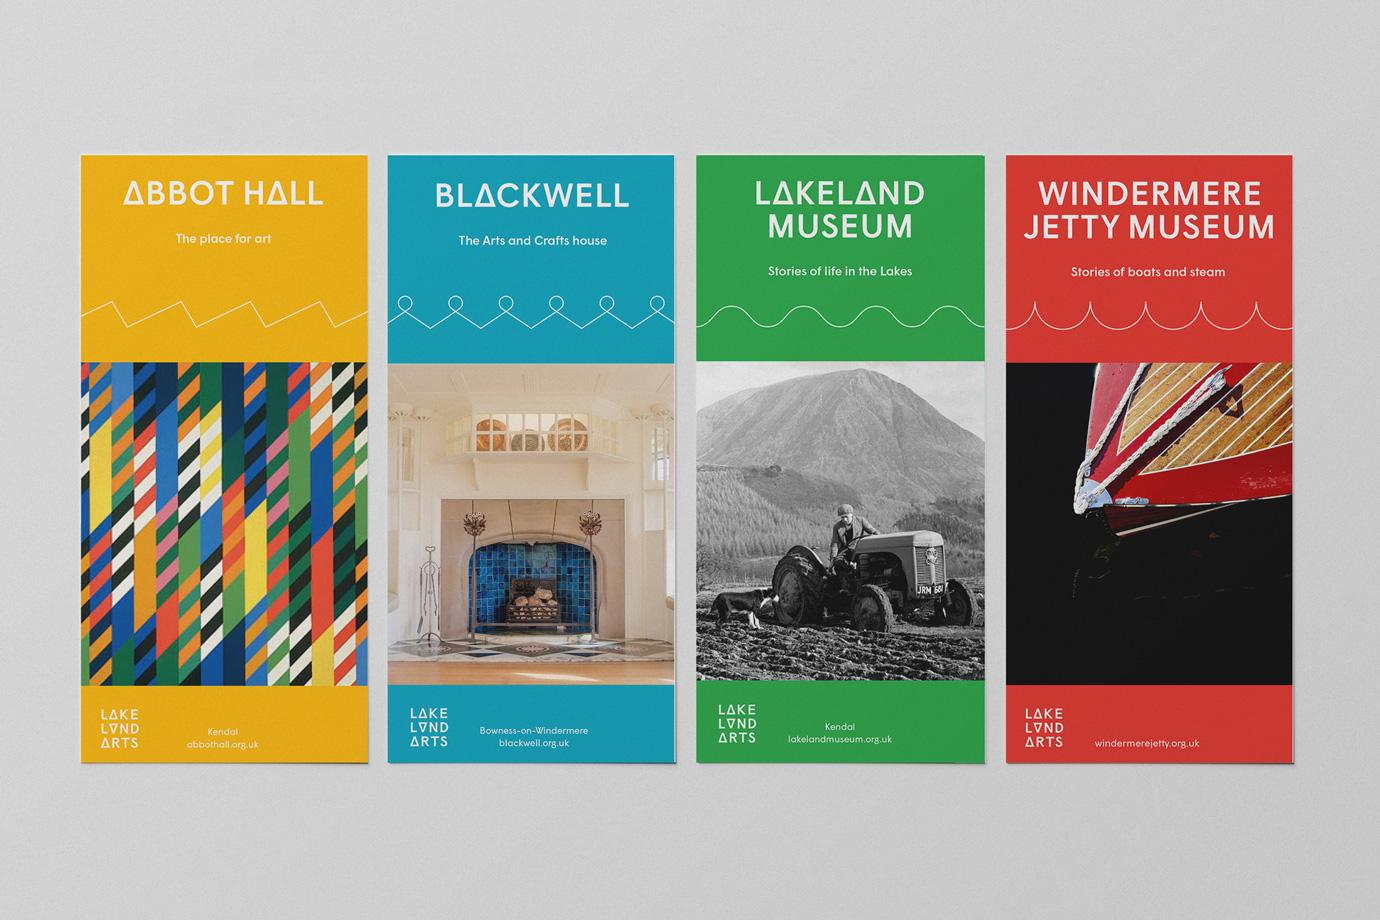 https://spystudio.co.uk/wp-content/uploads/2021/03/Lakeland_Arts_Leaflets_w_journal-1-1380x920.jpg